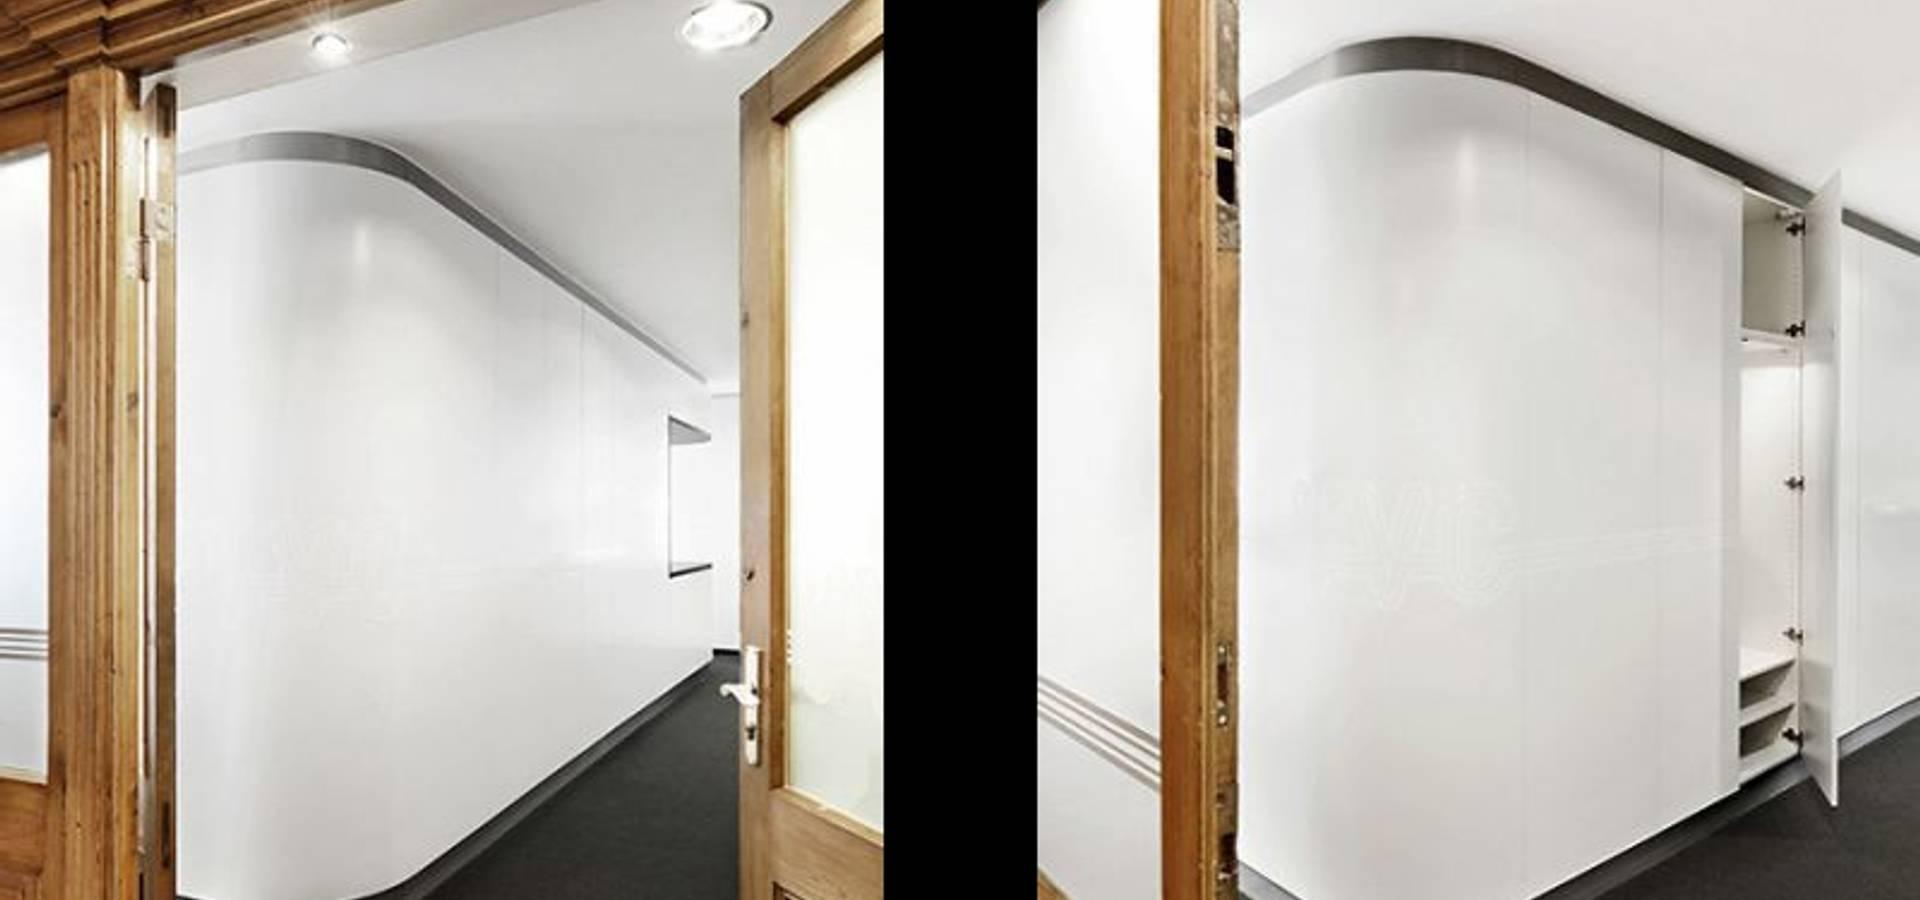 [lu:p] Architektur GmbH